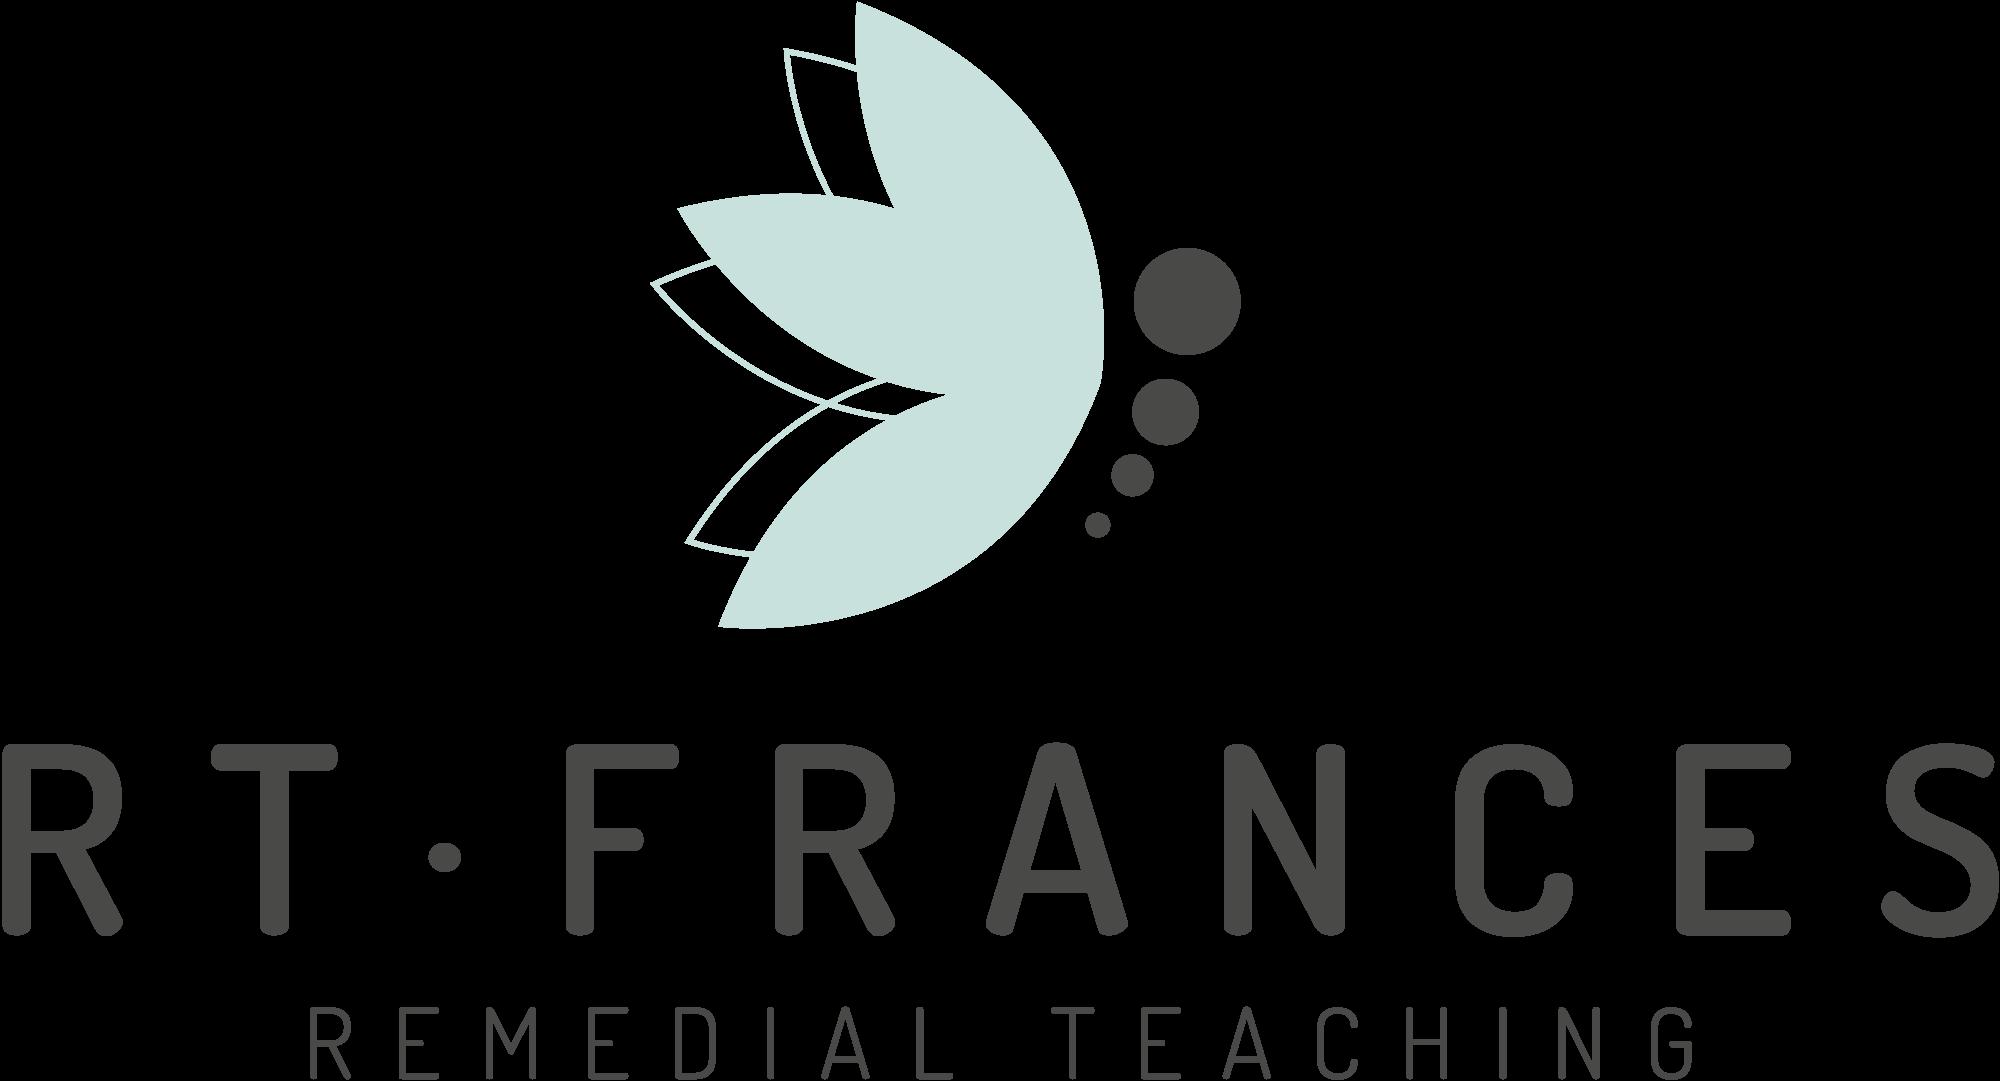 RT.Frances